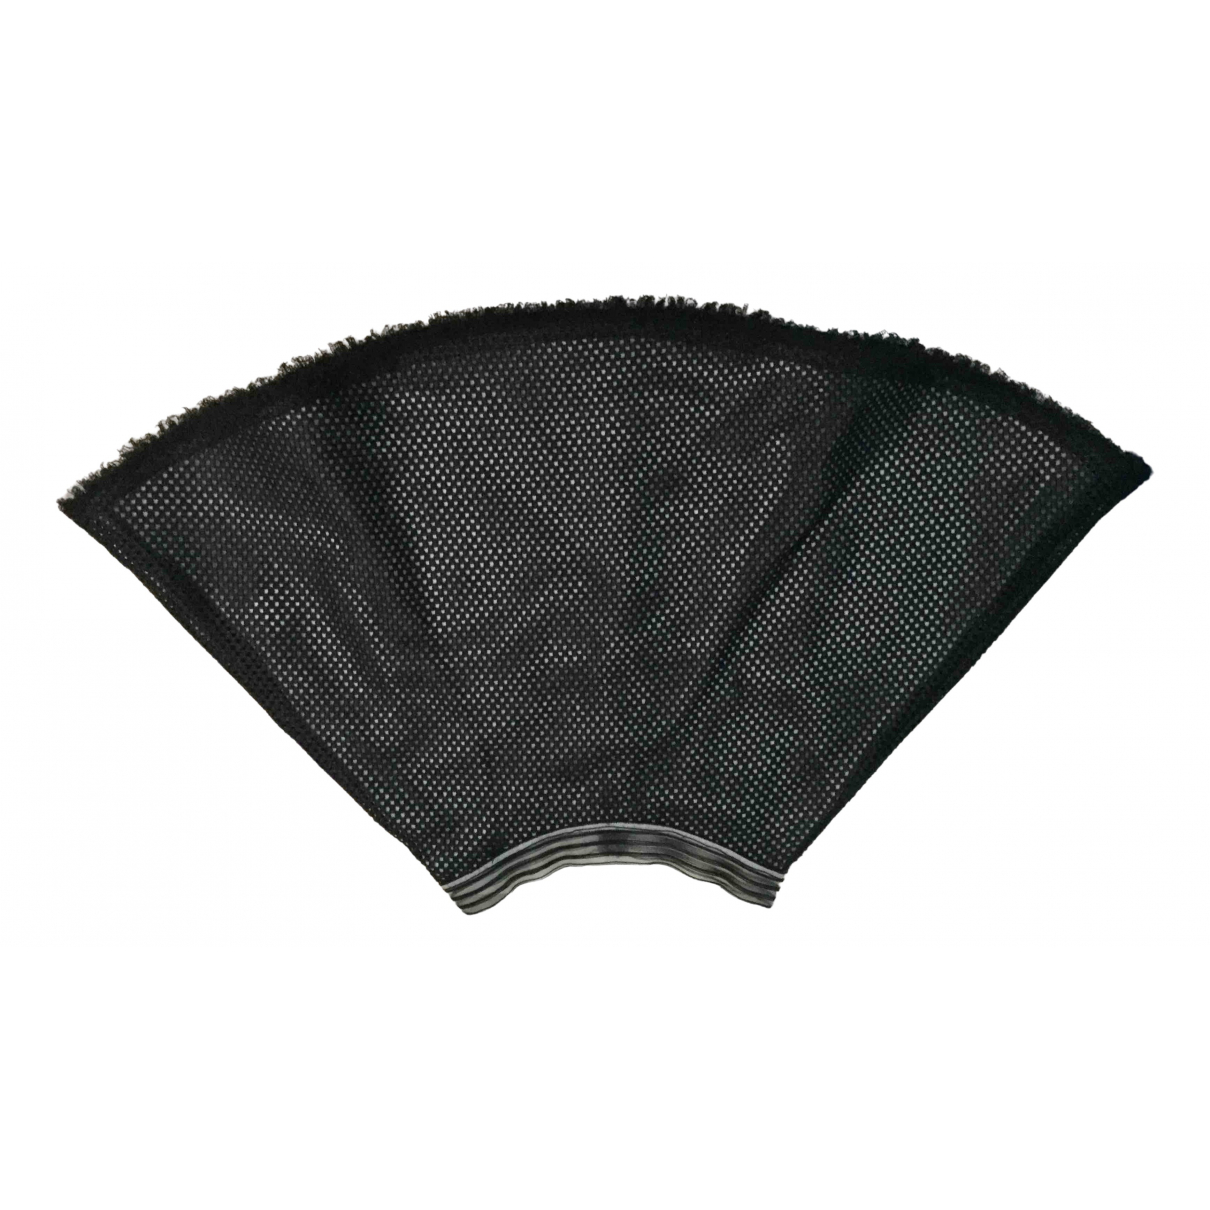 Maria Grazia Severi - Jupe   pour femme en coton - elasthane - gris